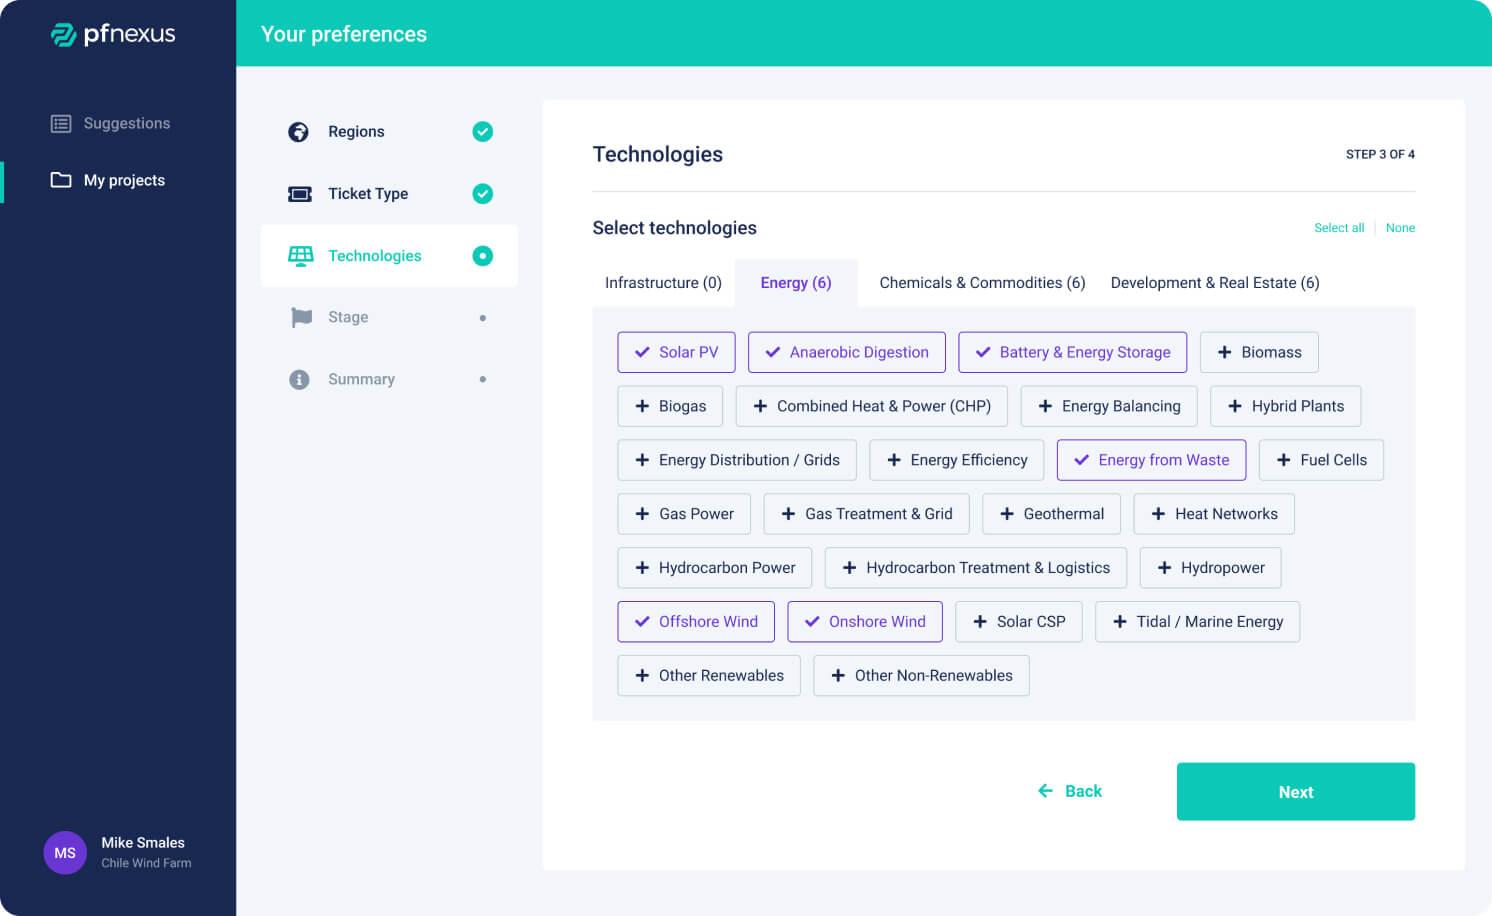 PF Nexus capital preference technologies screen